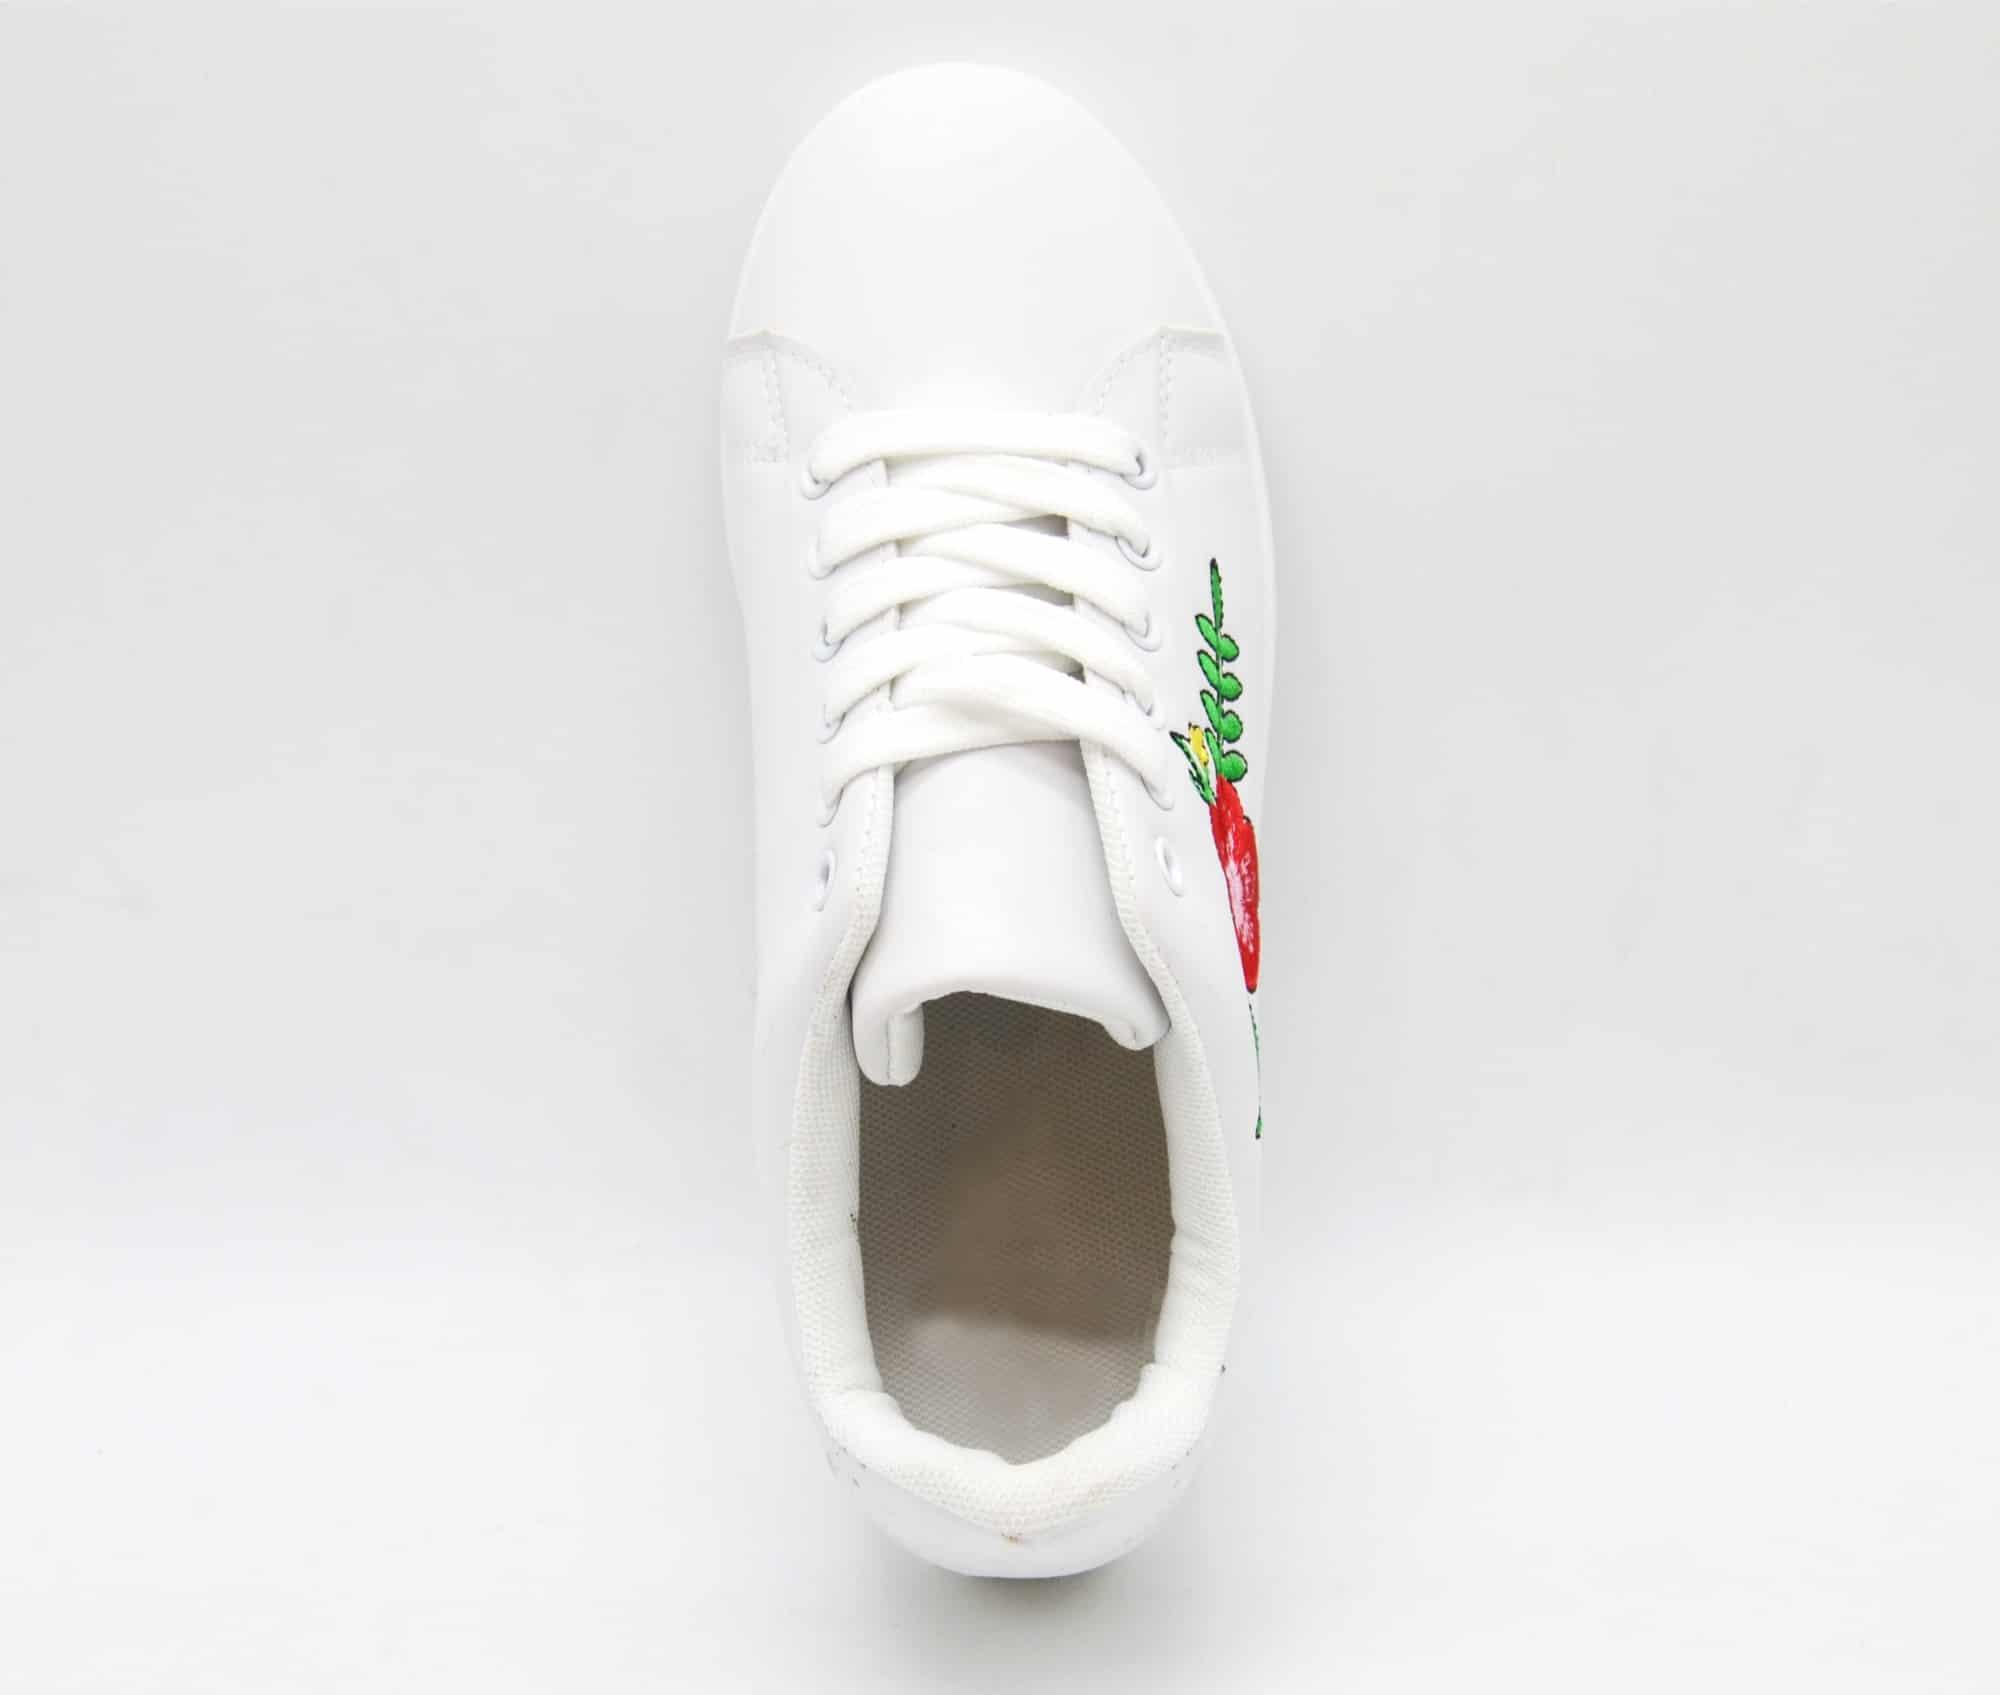 SHY45 * Baskets Tennis Sneakers Simili Cuir avec Broderie Fleurs Multicolore (Blanc)